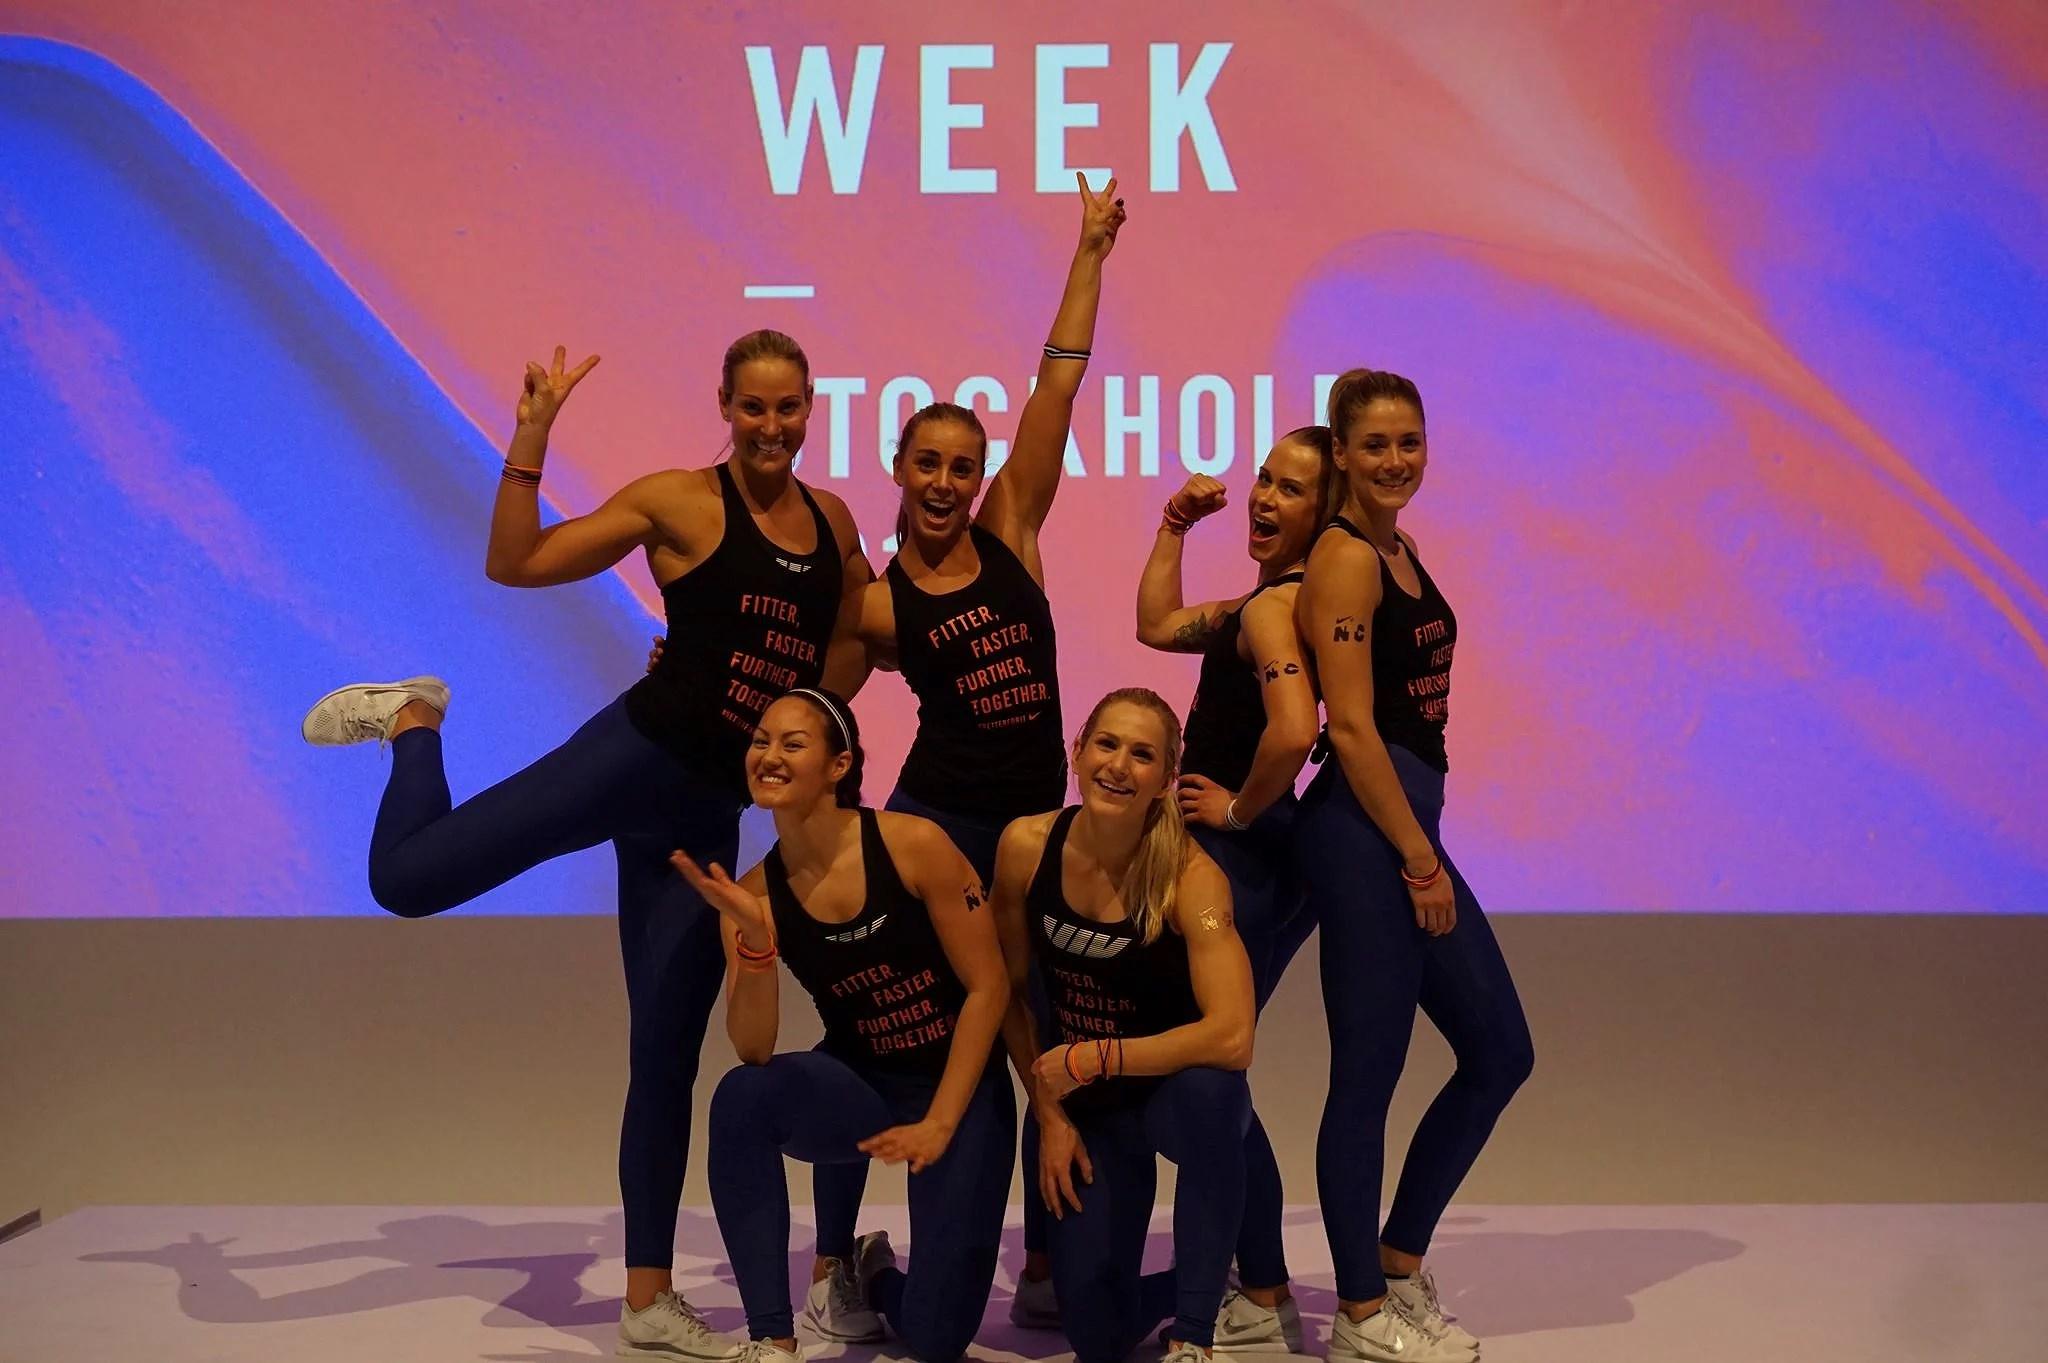 Nike Women's Week Stockholm